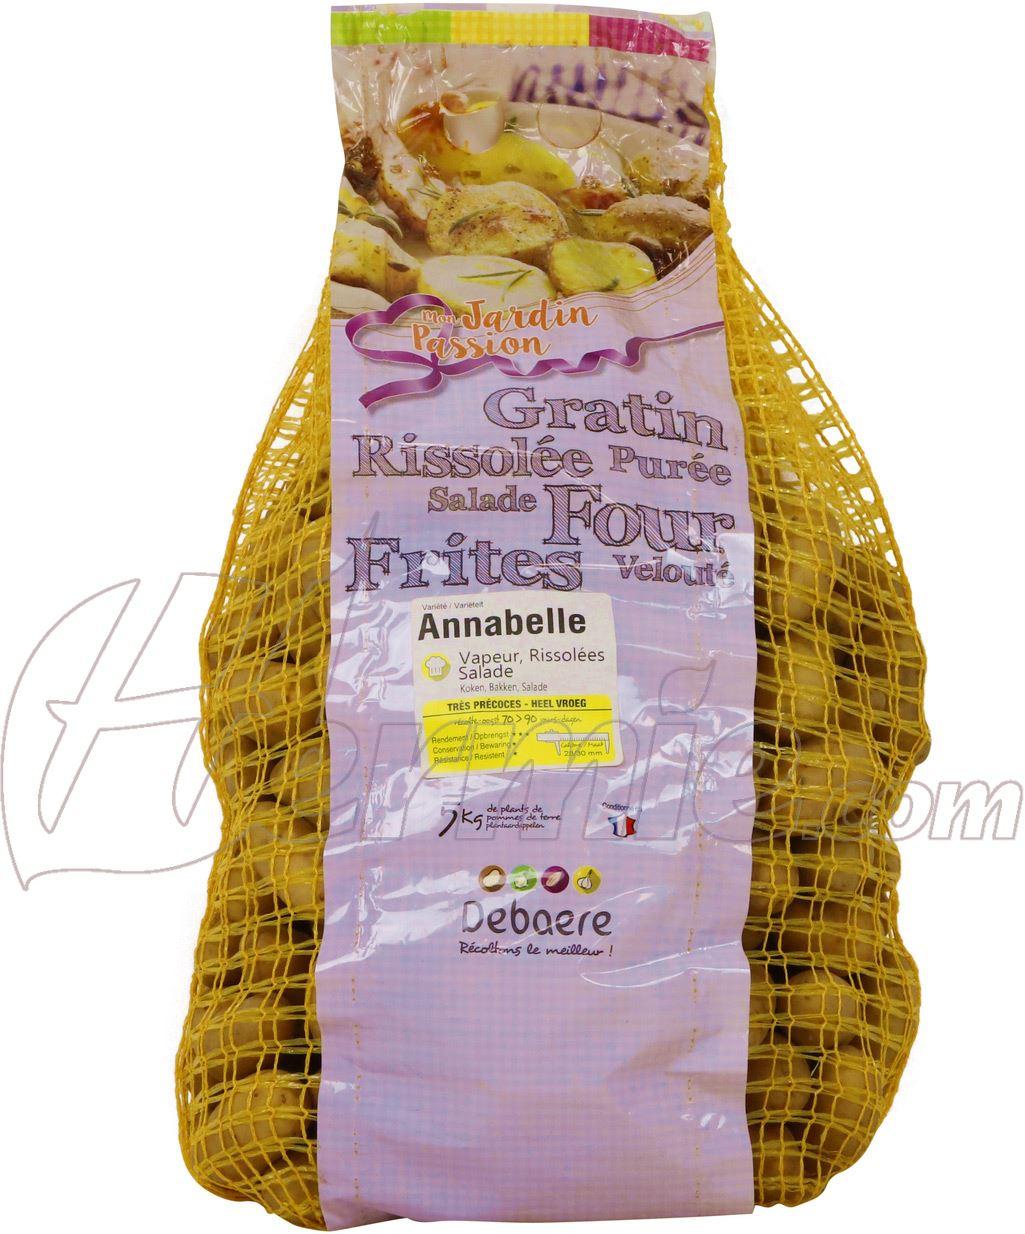 Pootaardappel-Annabelle-zak-5kg-28-30-Frankrijk-